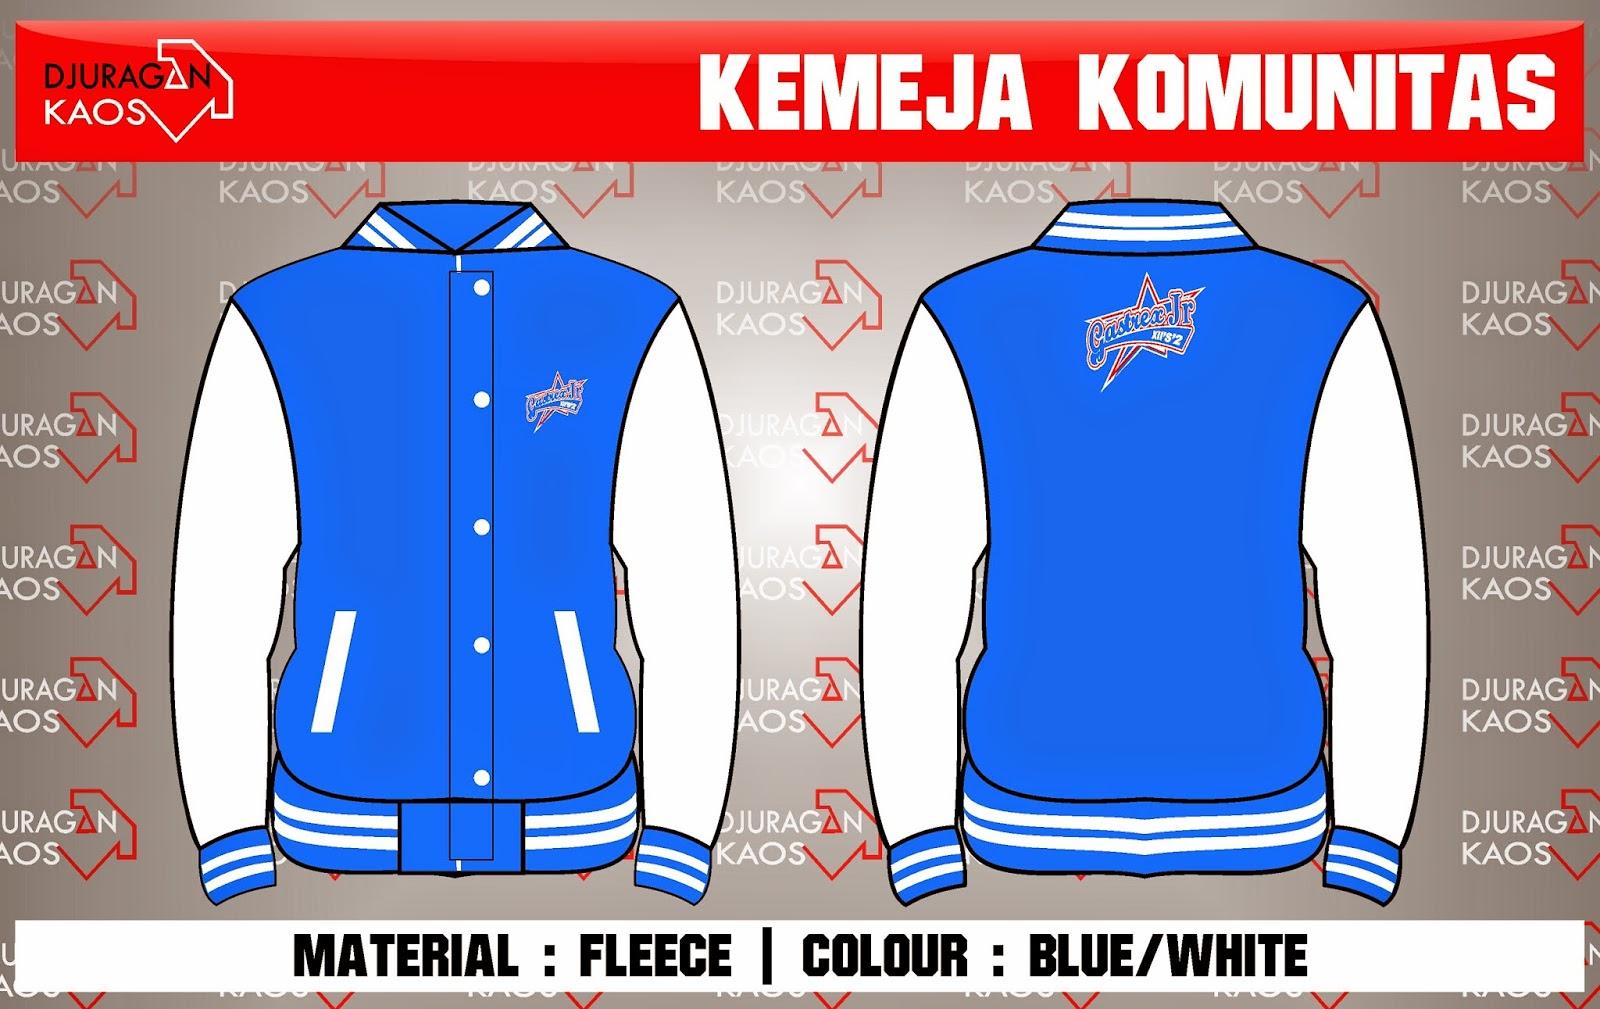 Accecories Design Order By Type Jaket Material Fleece Colour Blue White Quantity Pcs Diposting Djuragan Kaos